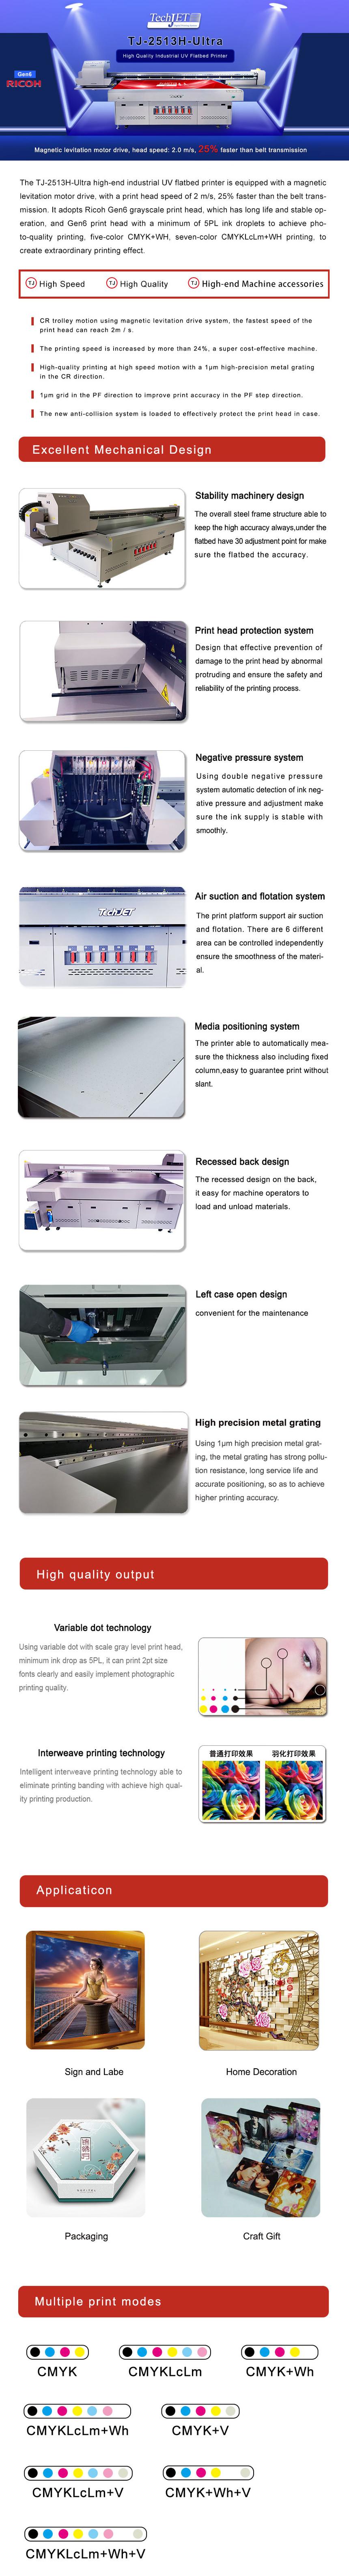 TJ-2513H-Ultra英文产品说明.jpg